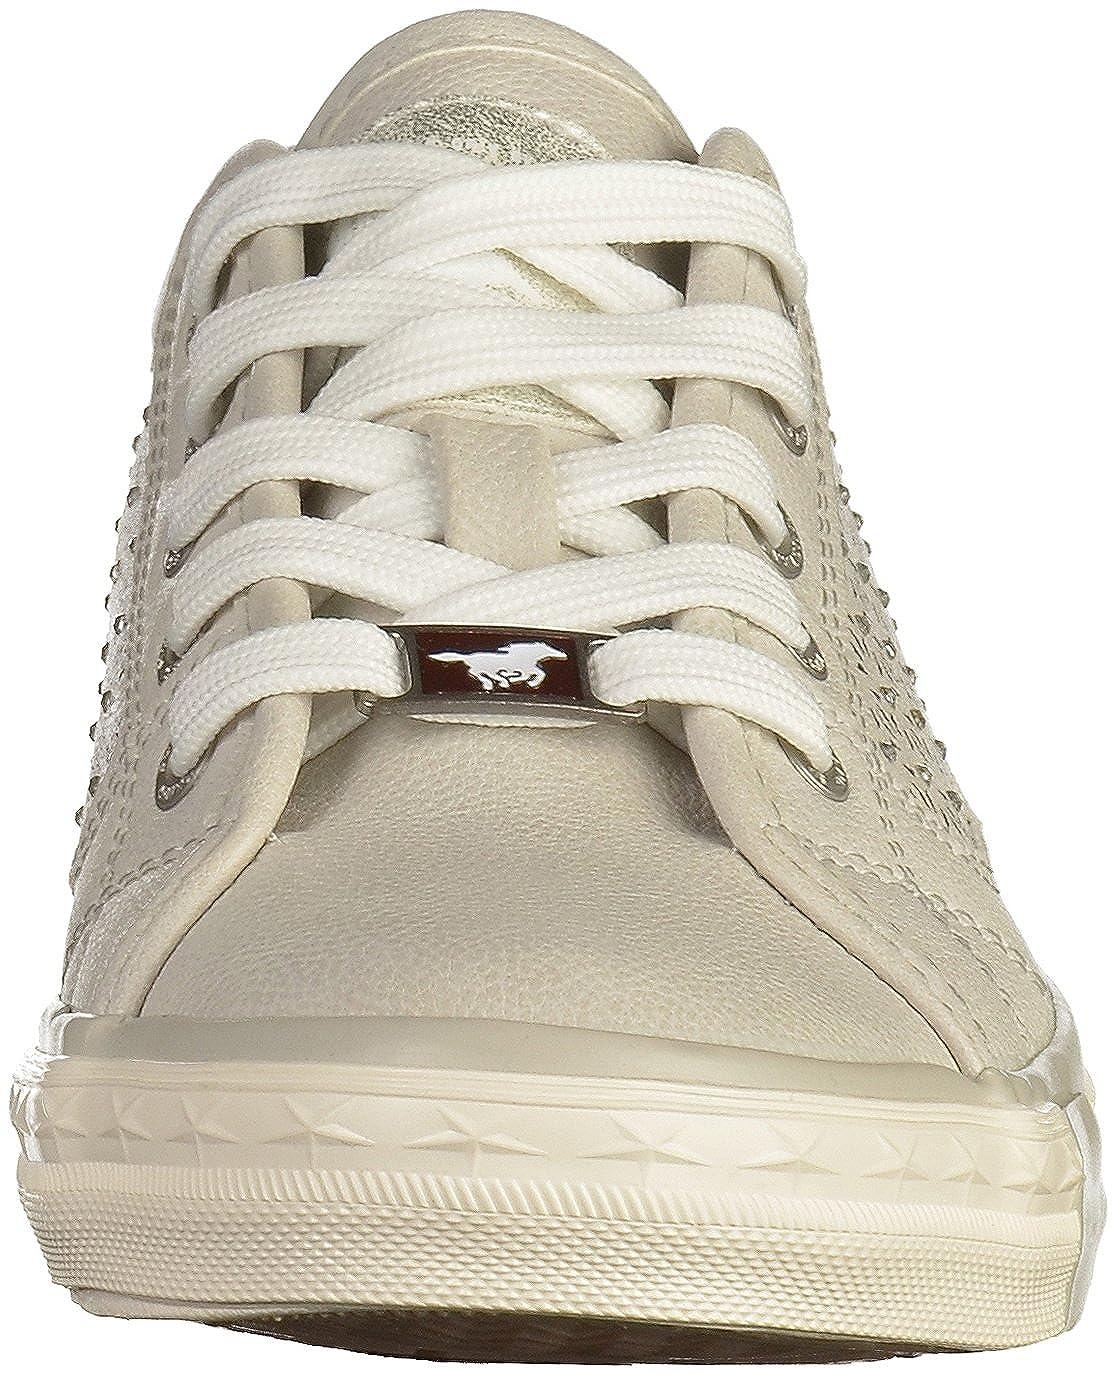 Sacs Baskets 304 Chaussures Femmes Qyacw5 Et Mustang 1146 rUWtTrxc1q